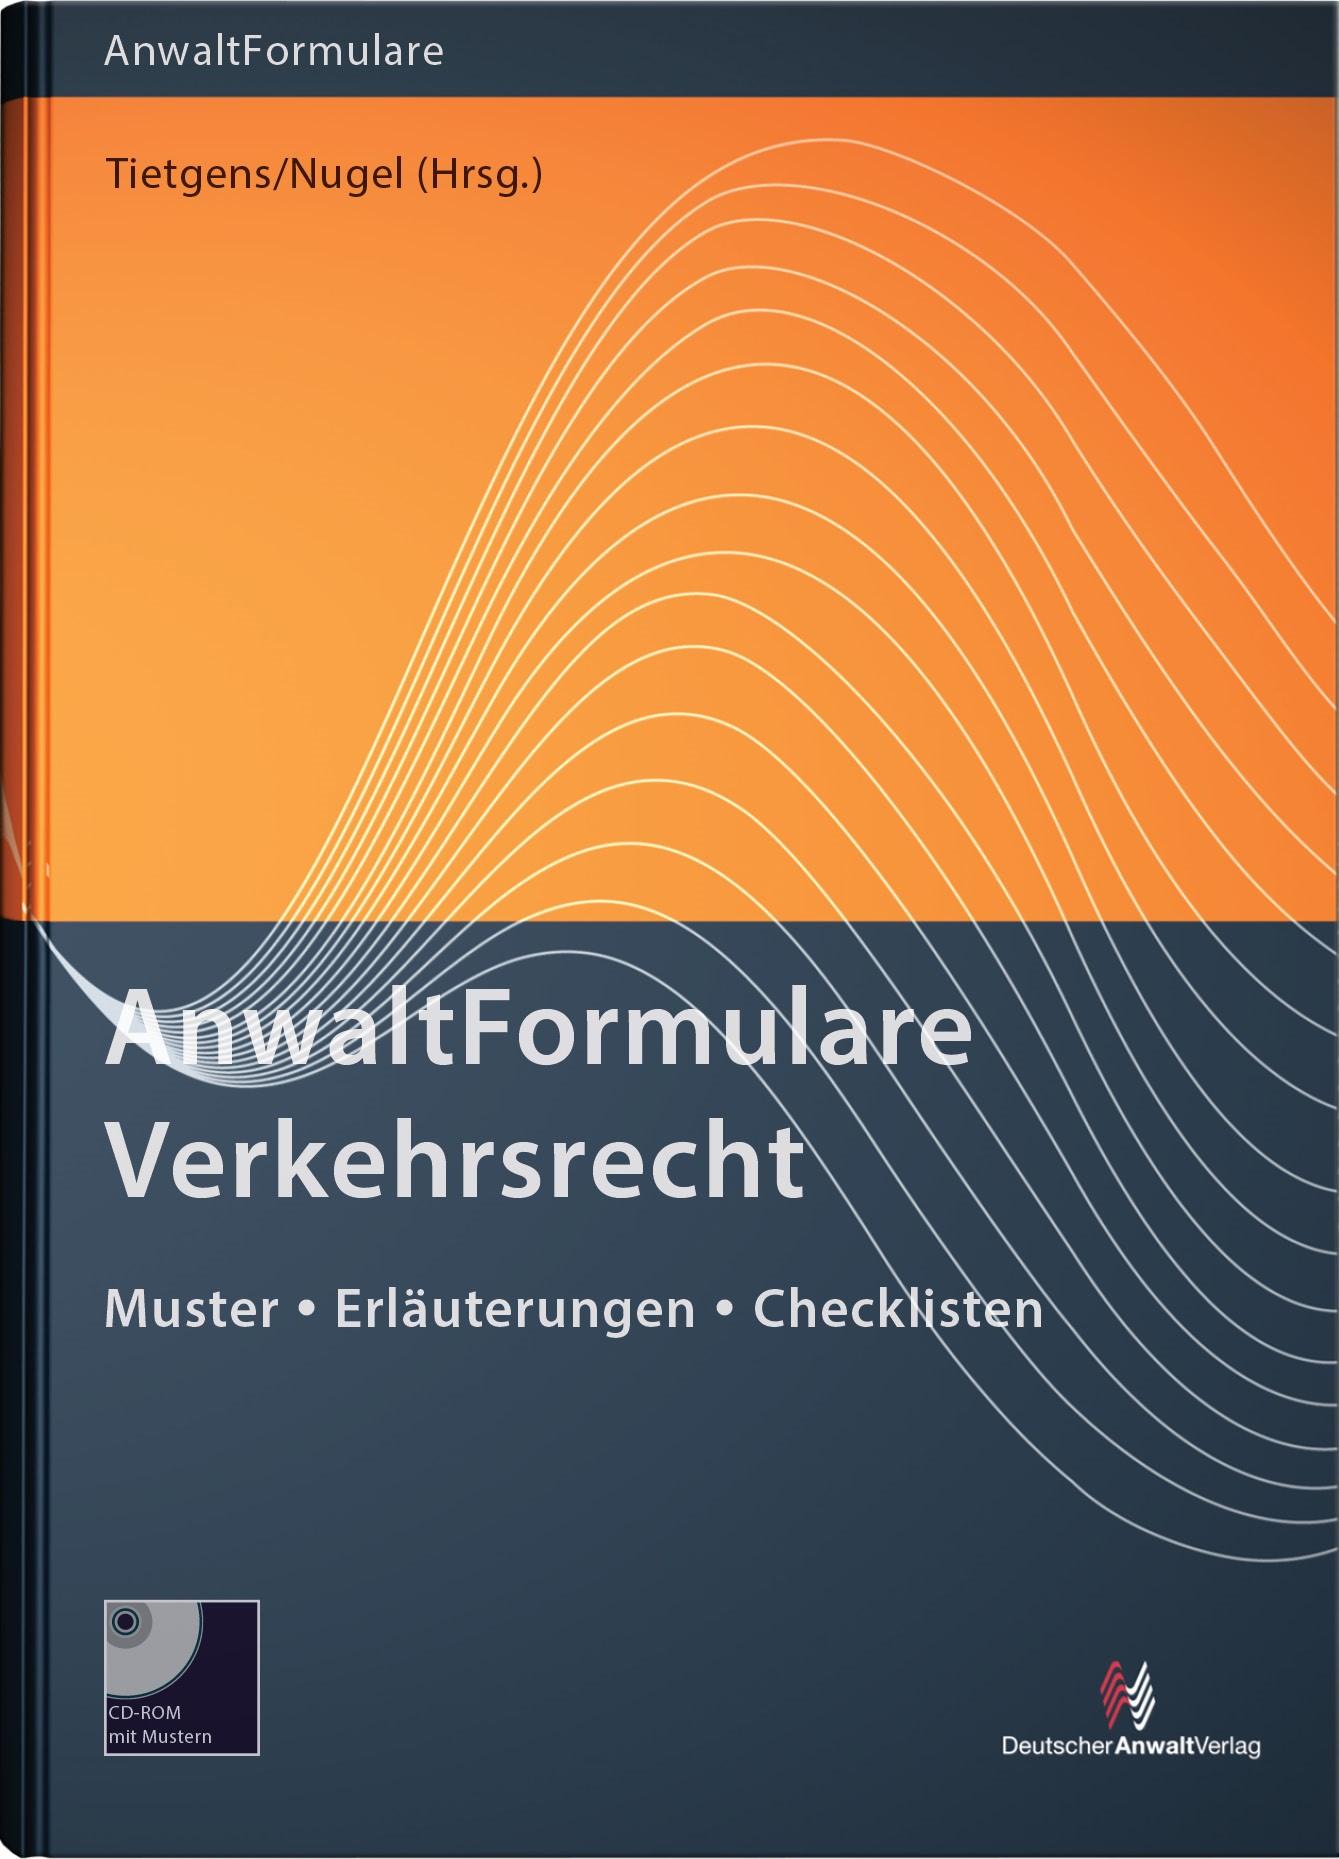 AnwaltFormulare Verkehrsrecht | Tietgens / Nugel (Hrsg.) | 7. Auflage, 2016 | Buch (Cover)